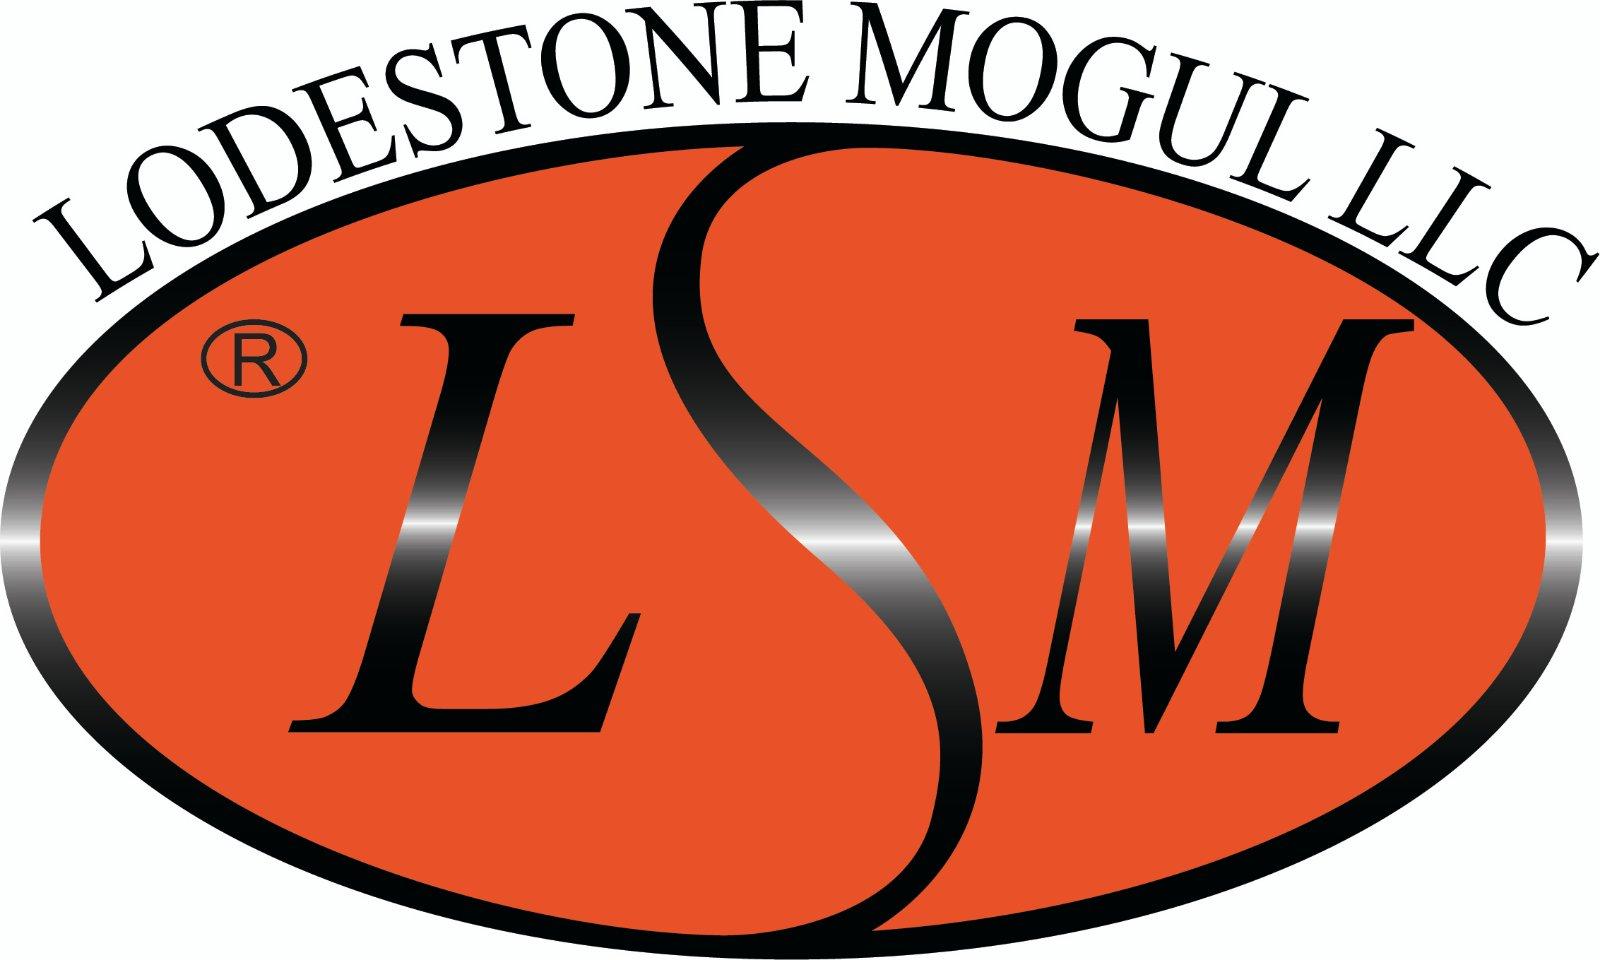 New Site: Lodestone Mogul